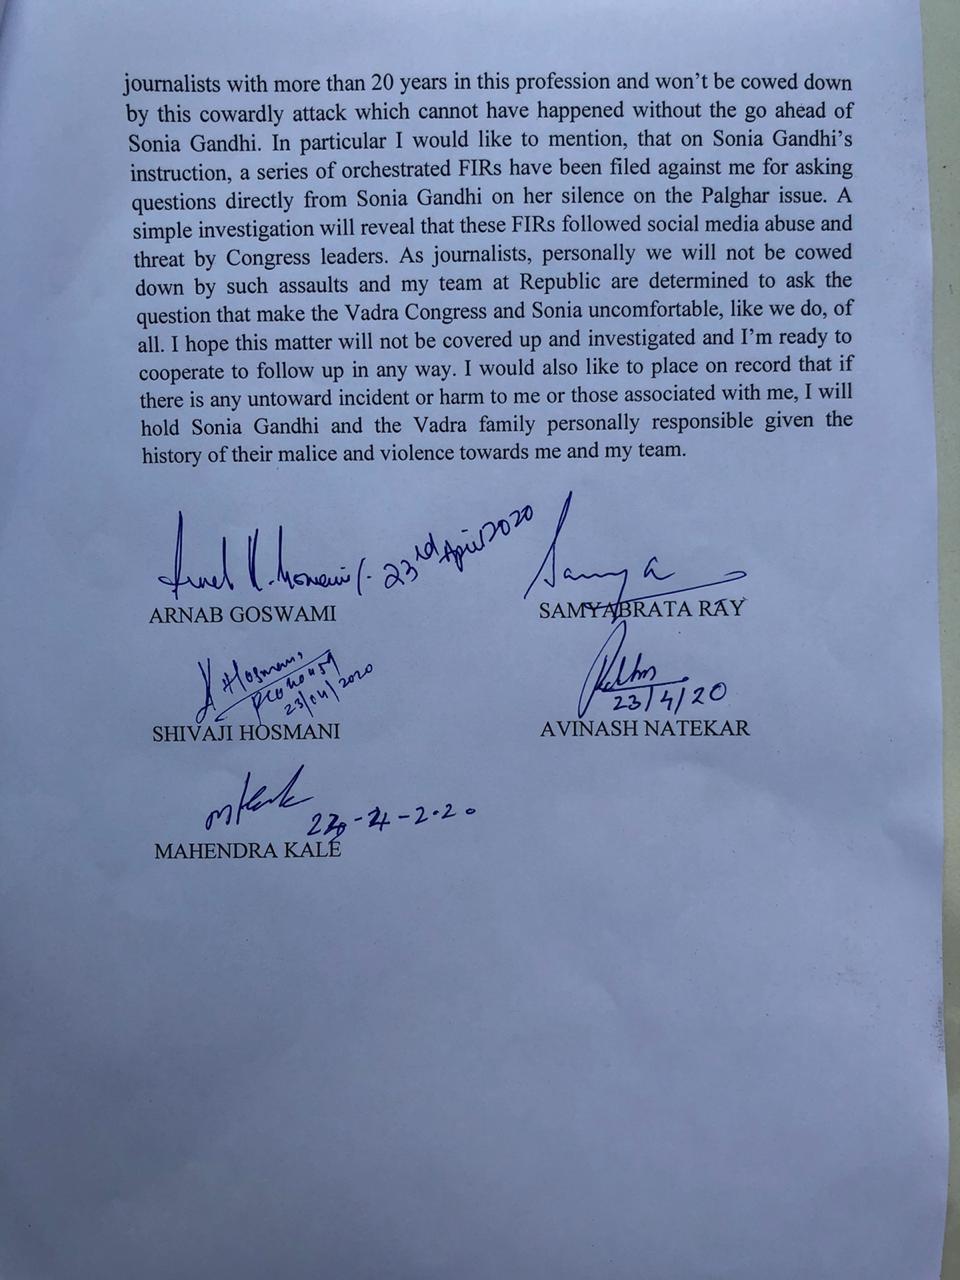 Arnab Goswami complaint